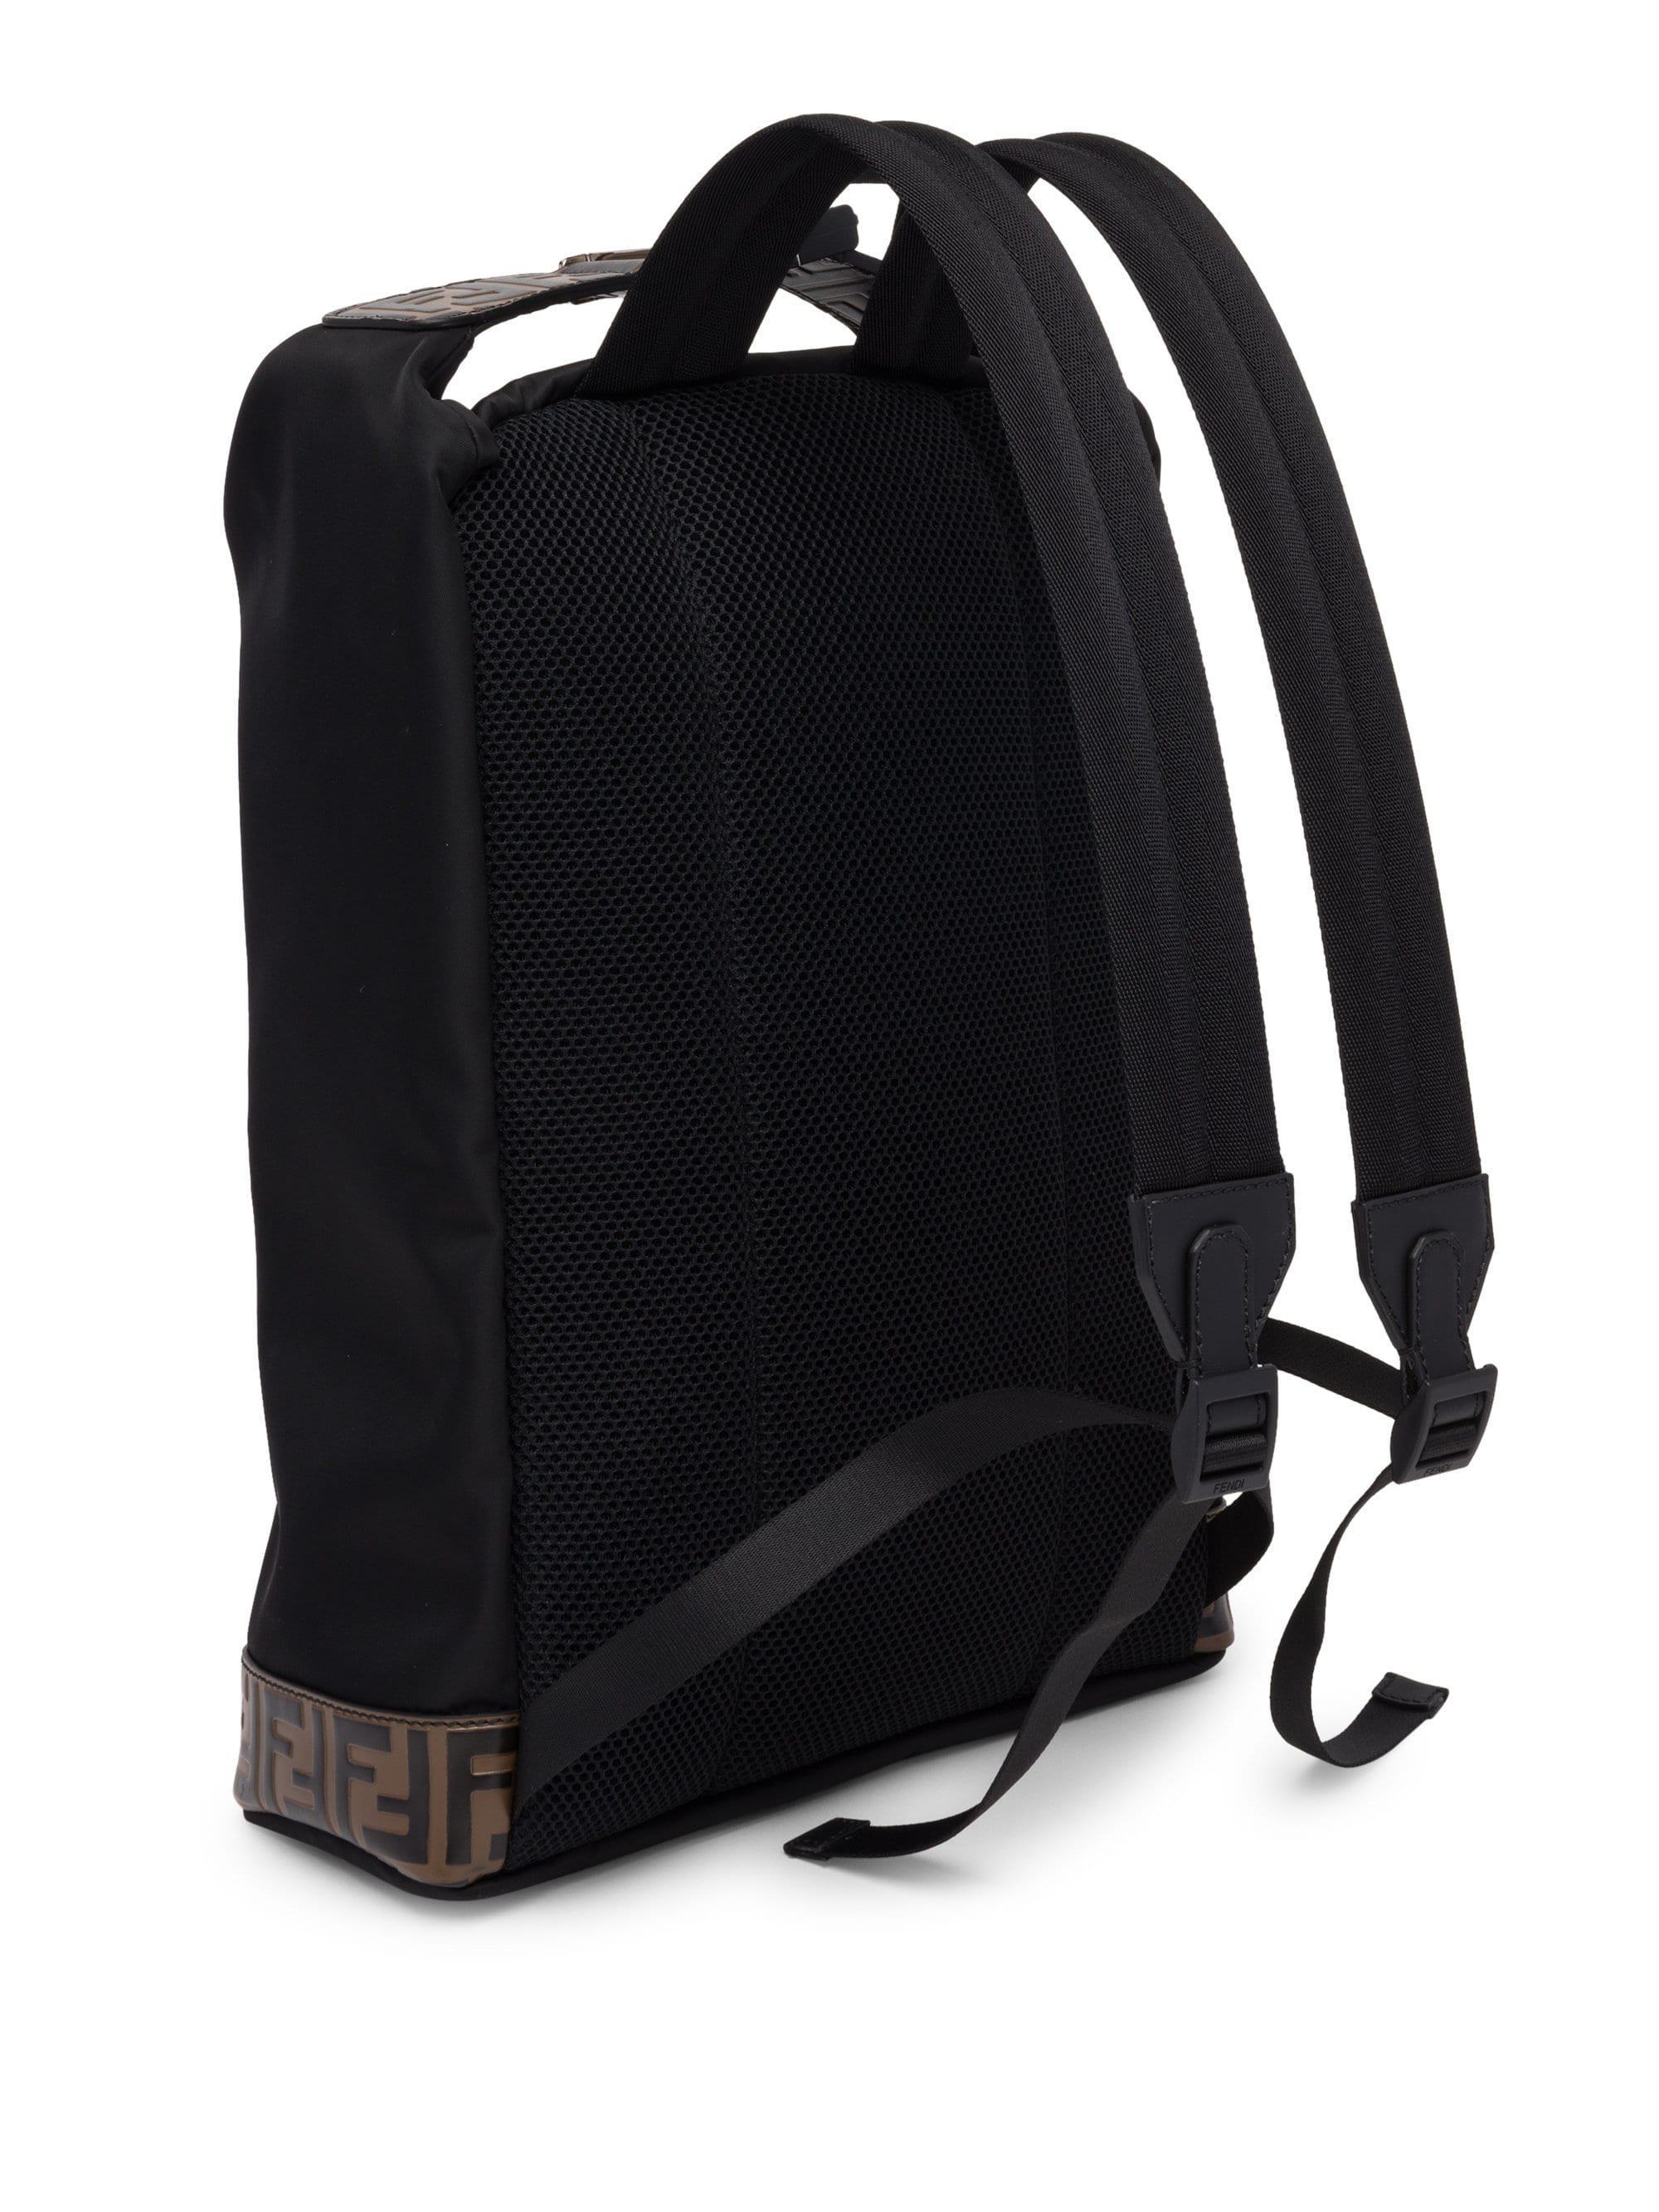 bb3b3d60f01a Fendi Ff Embossed Nylon Backpack Tote in Black for Men - Lyst